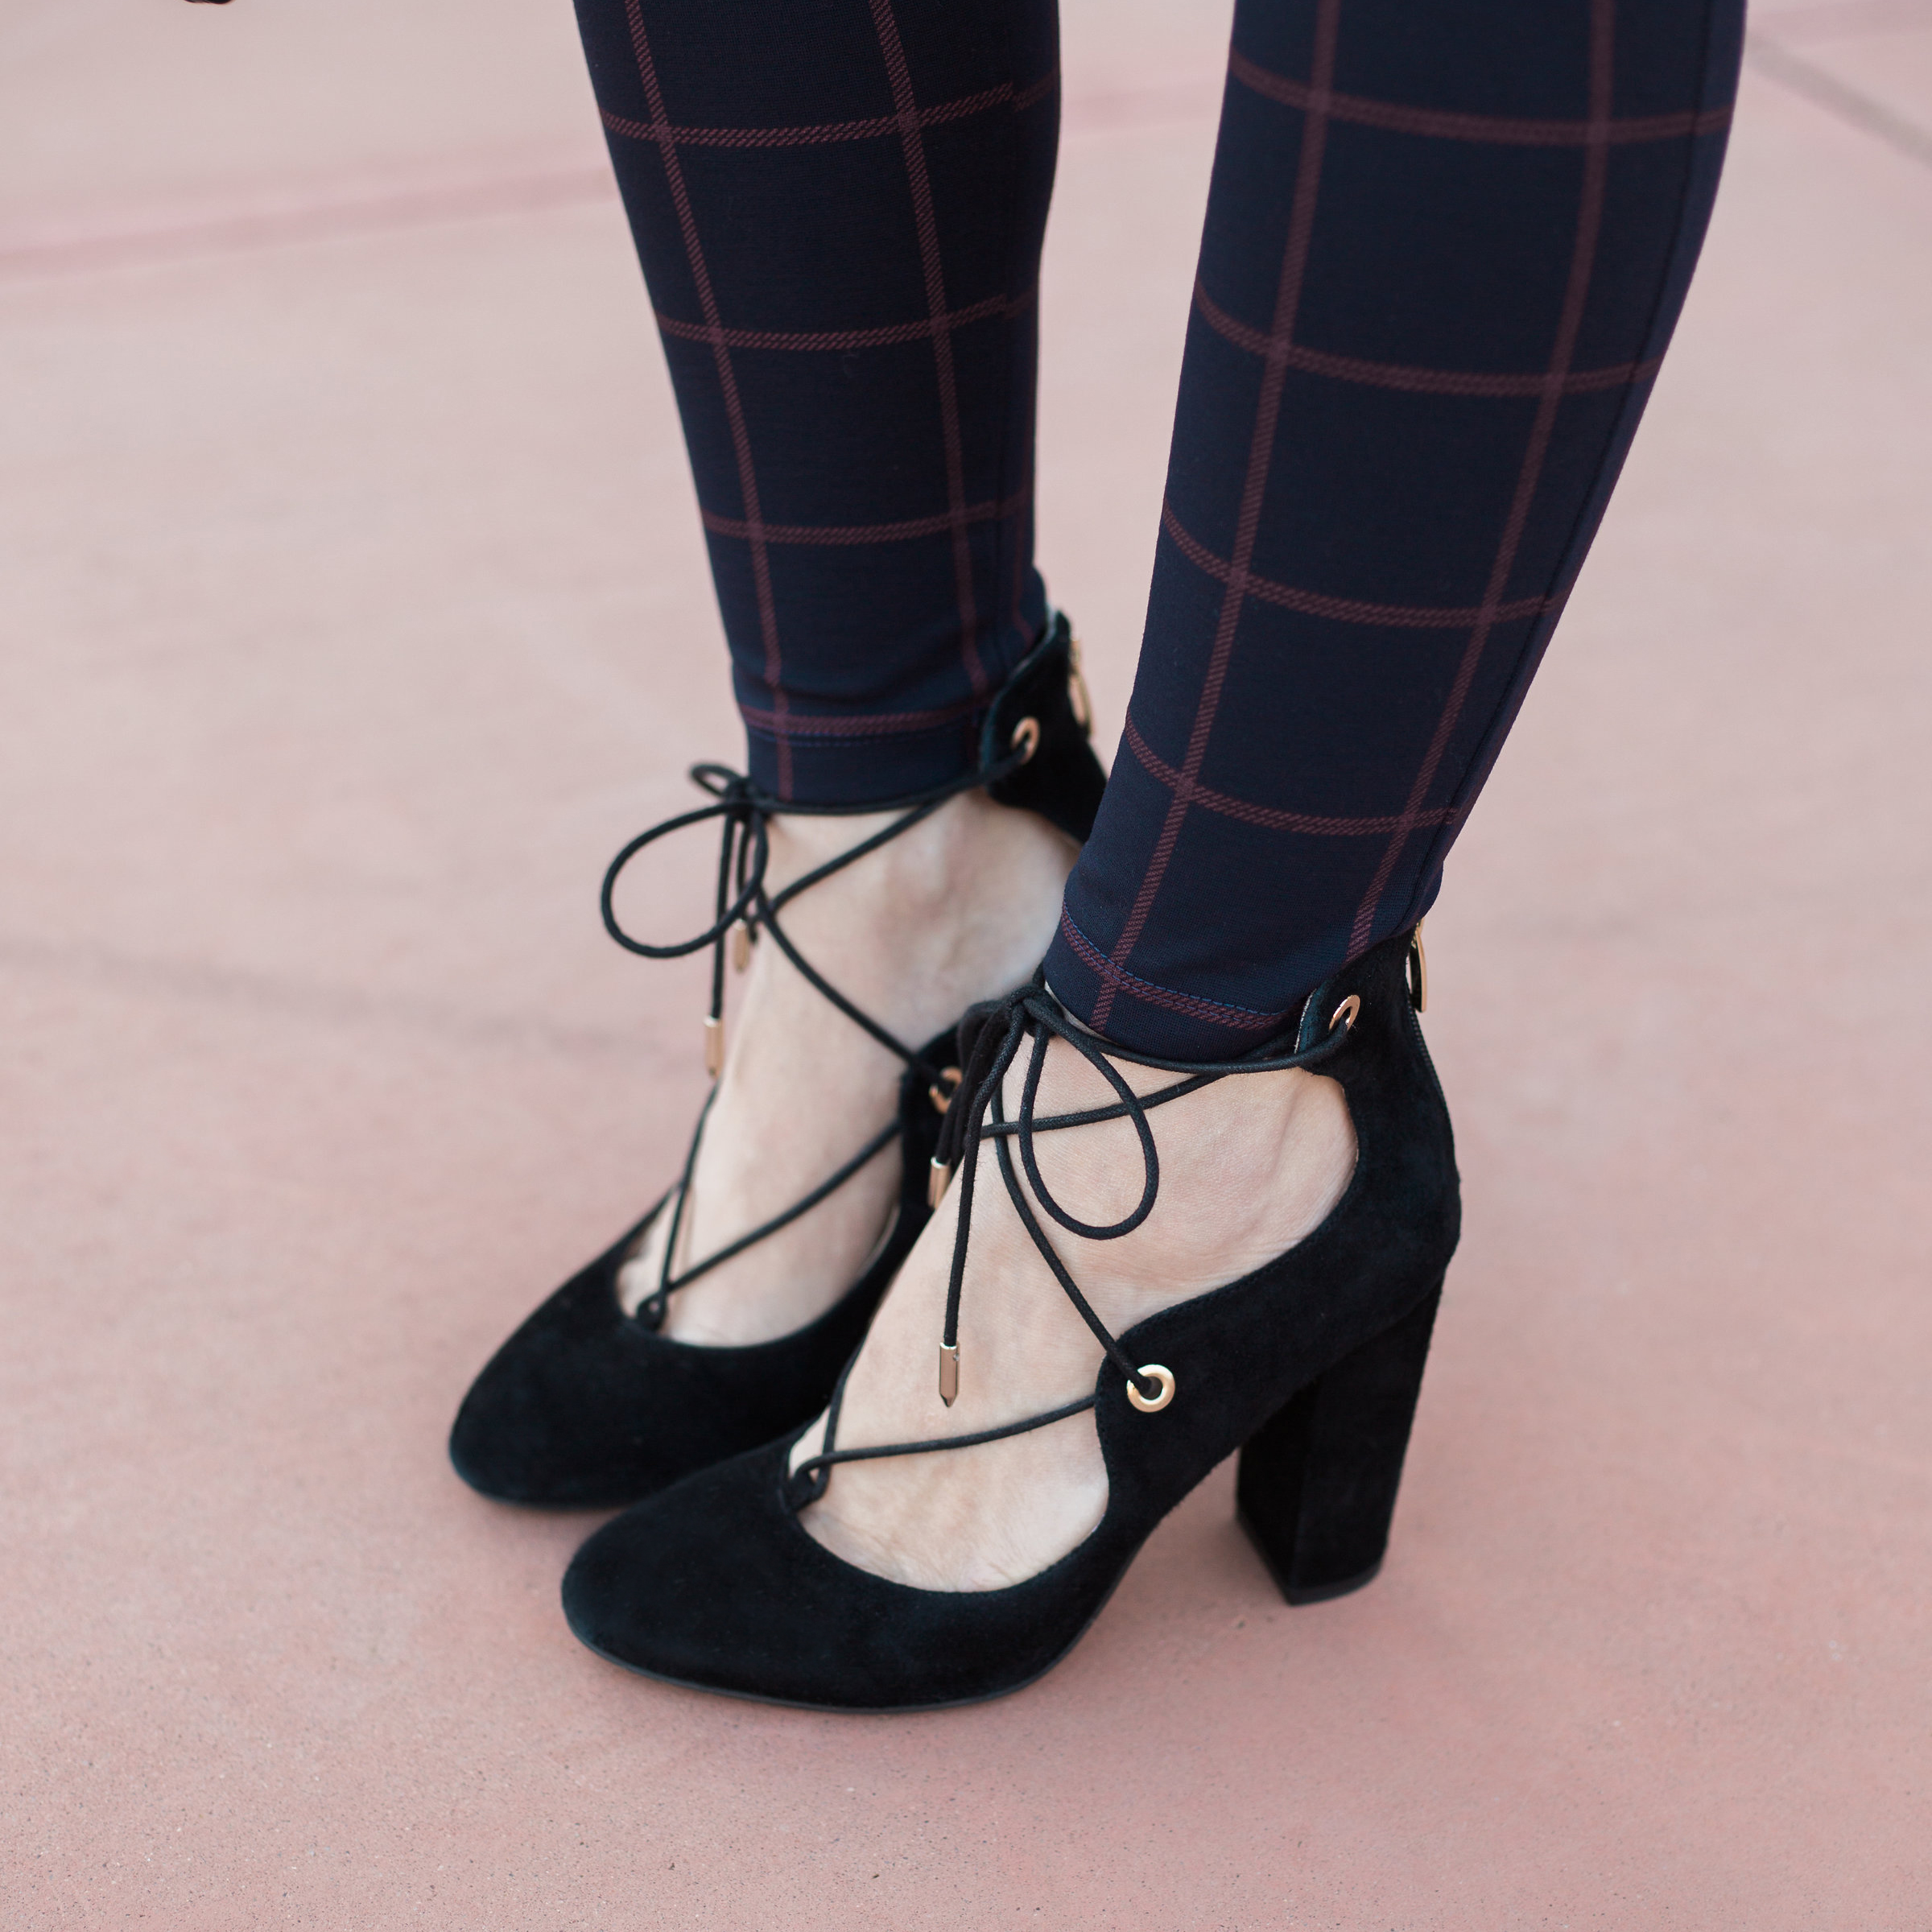 Lace-up black block heel